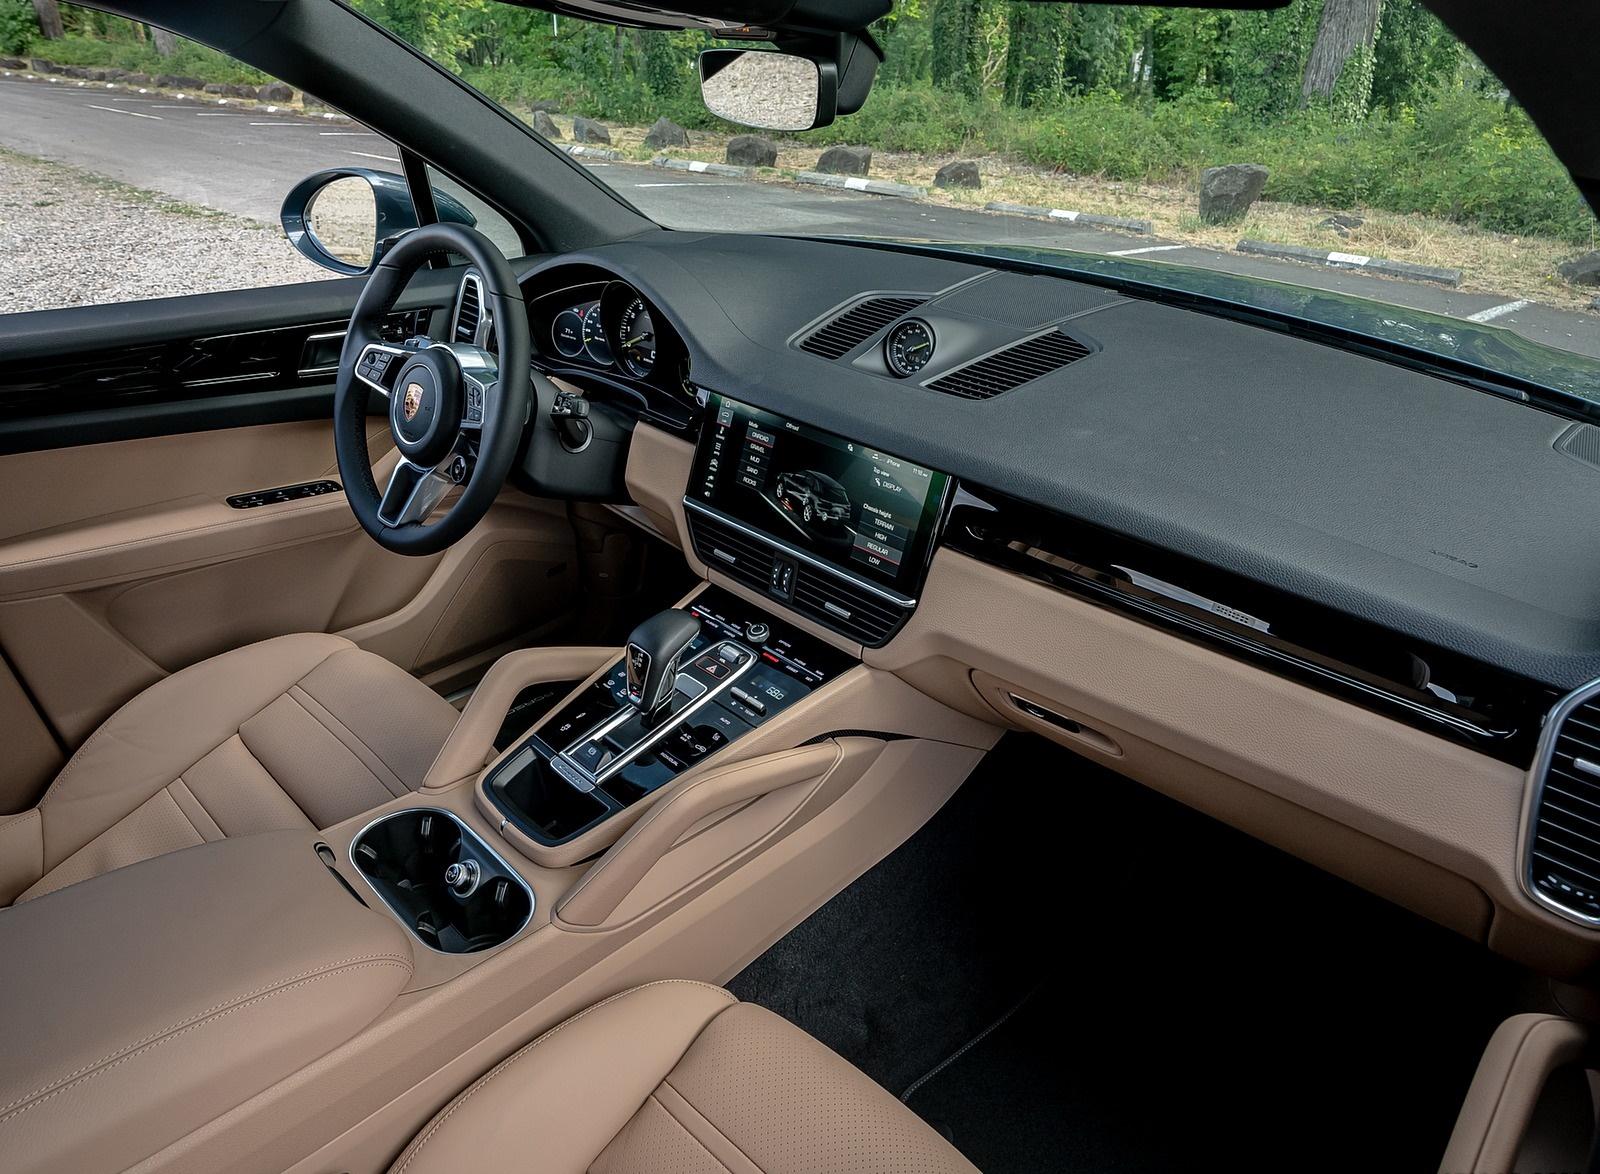 2019 Porsche Cayenne E-Hybrid (US-Spec) Interior Wallpapers #33 of 37